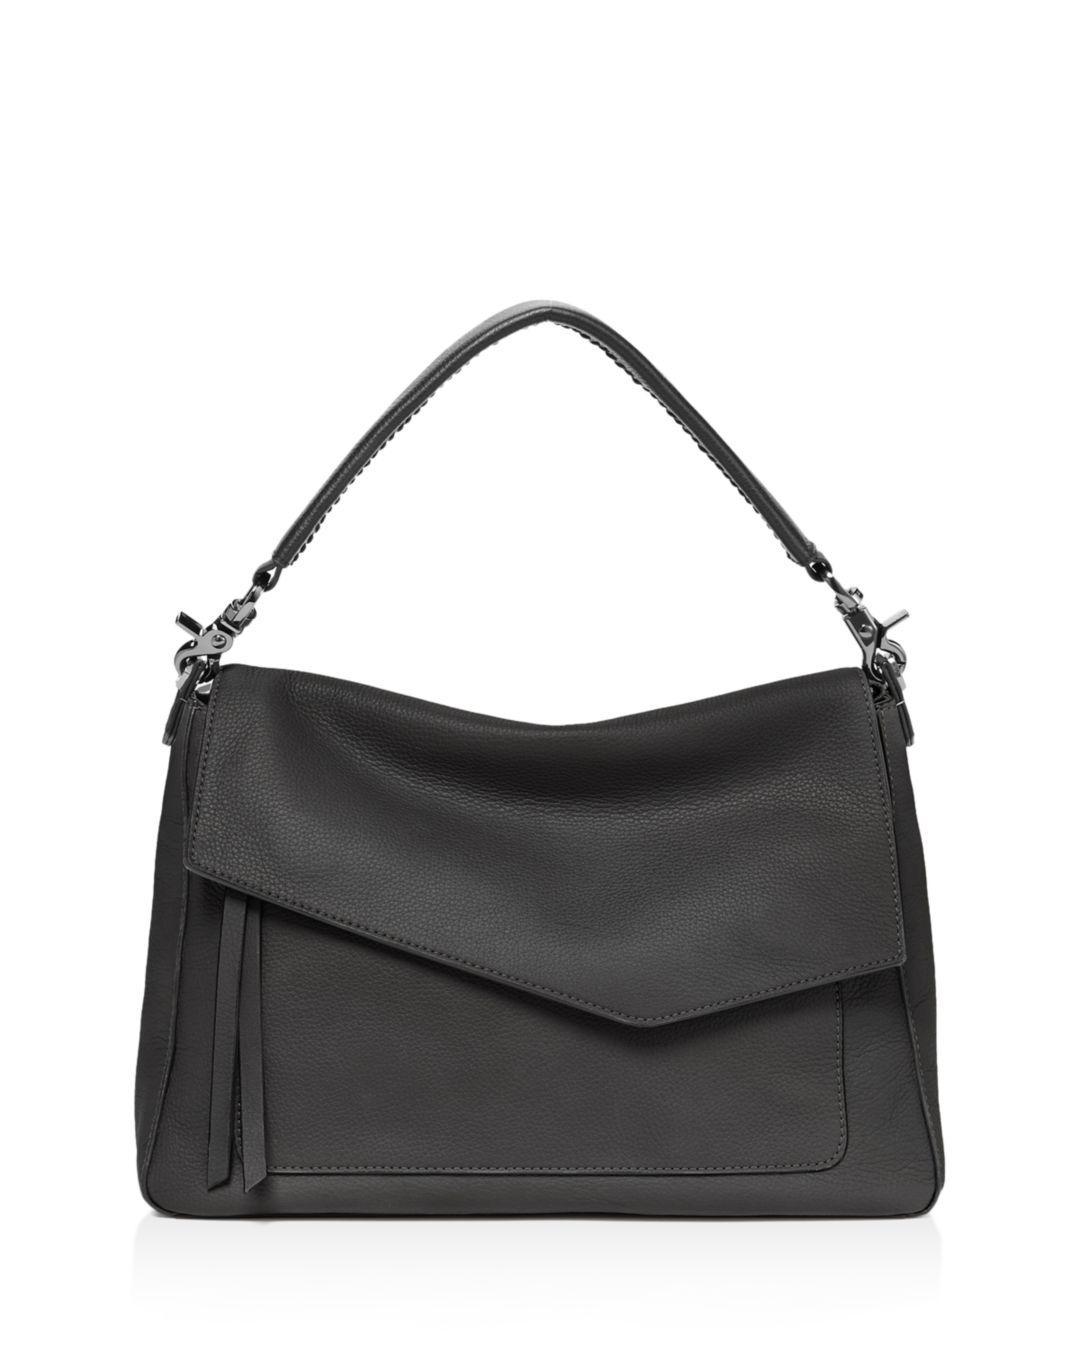 Lyst - Botkier Cobble Hill Medium Leather Hobo in Black d7d3d76c46b94